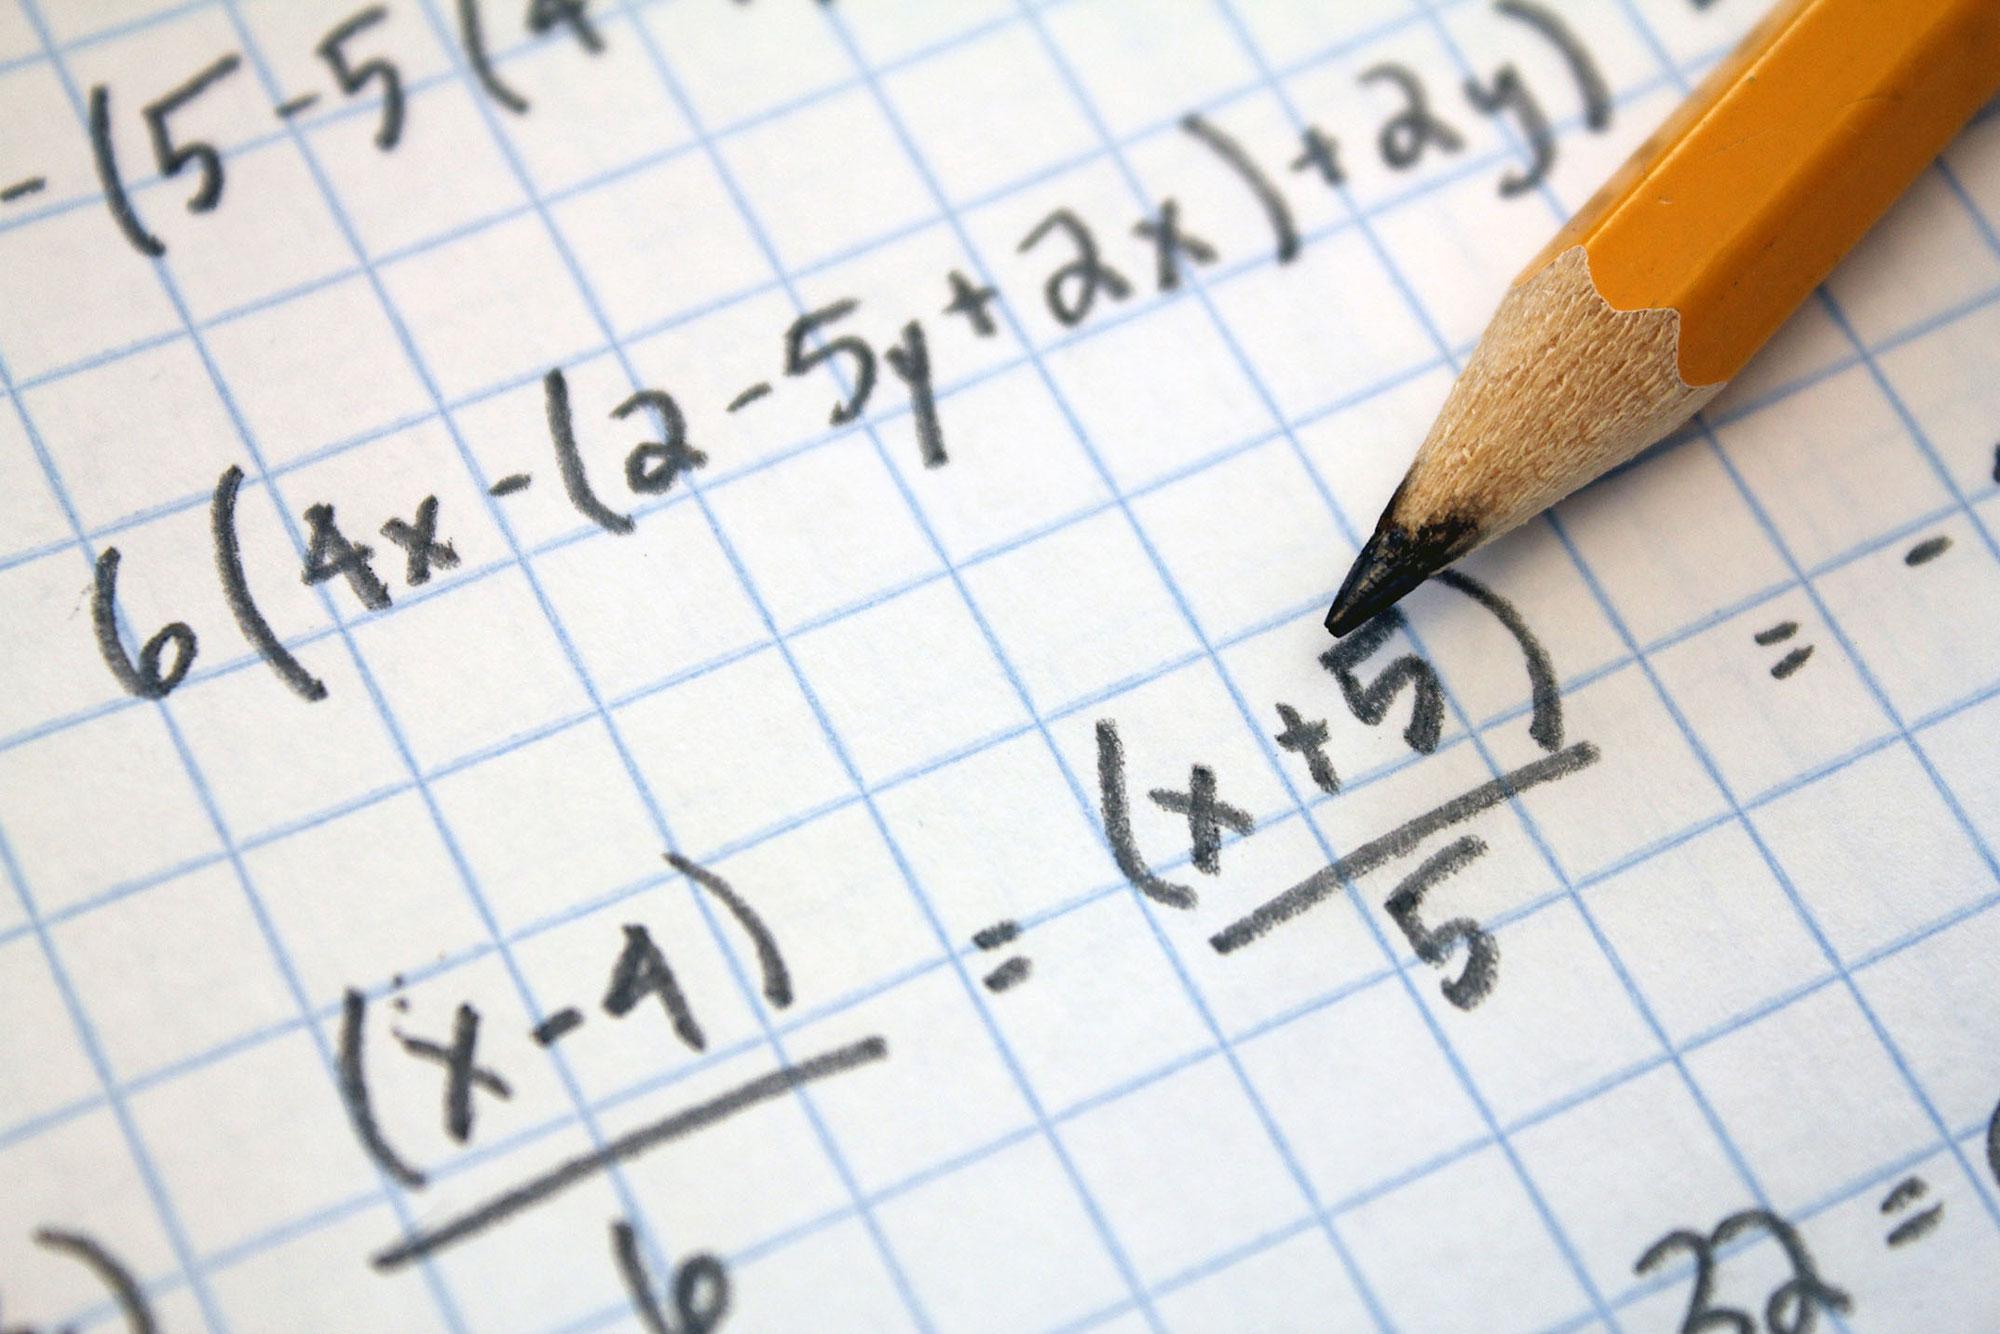 Математические расчеты в ставках на футбол